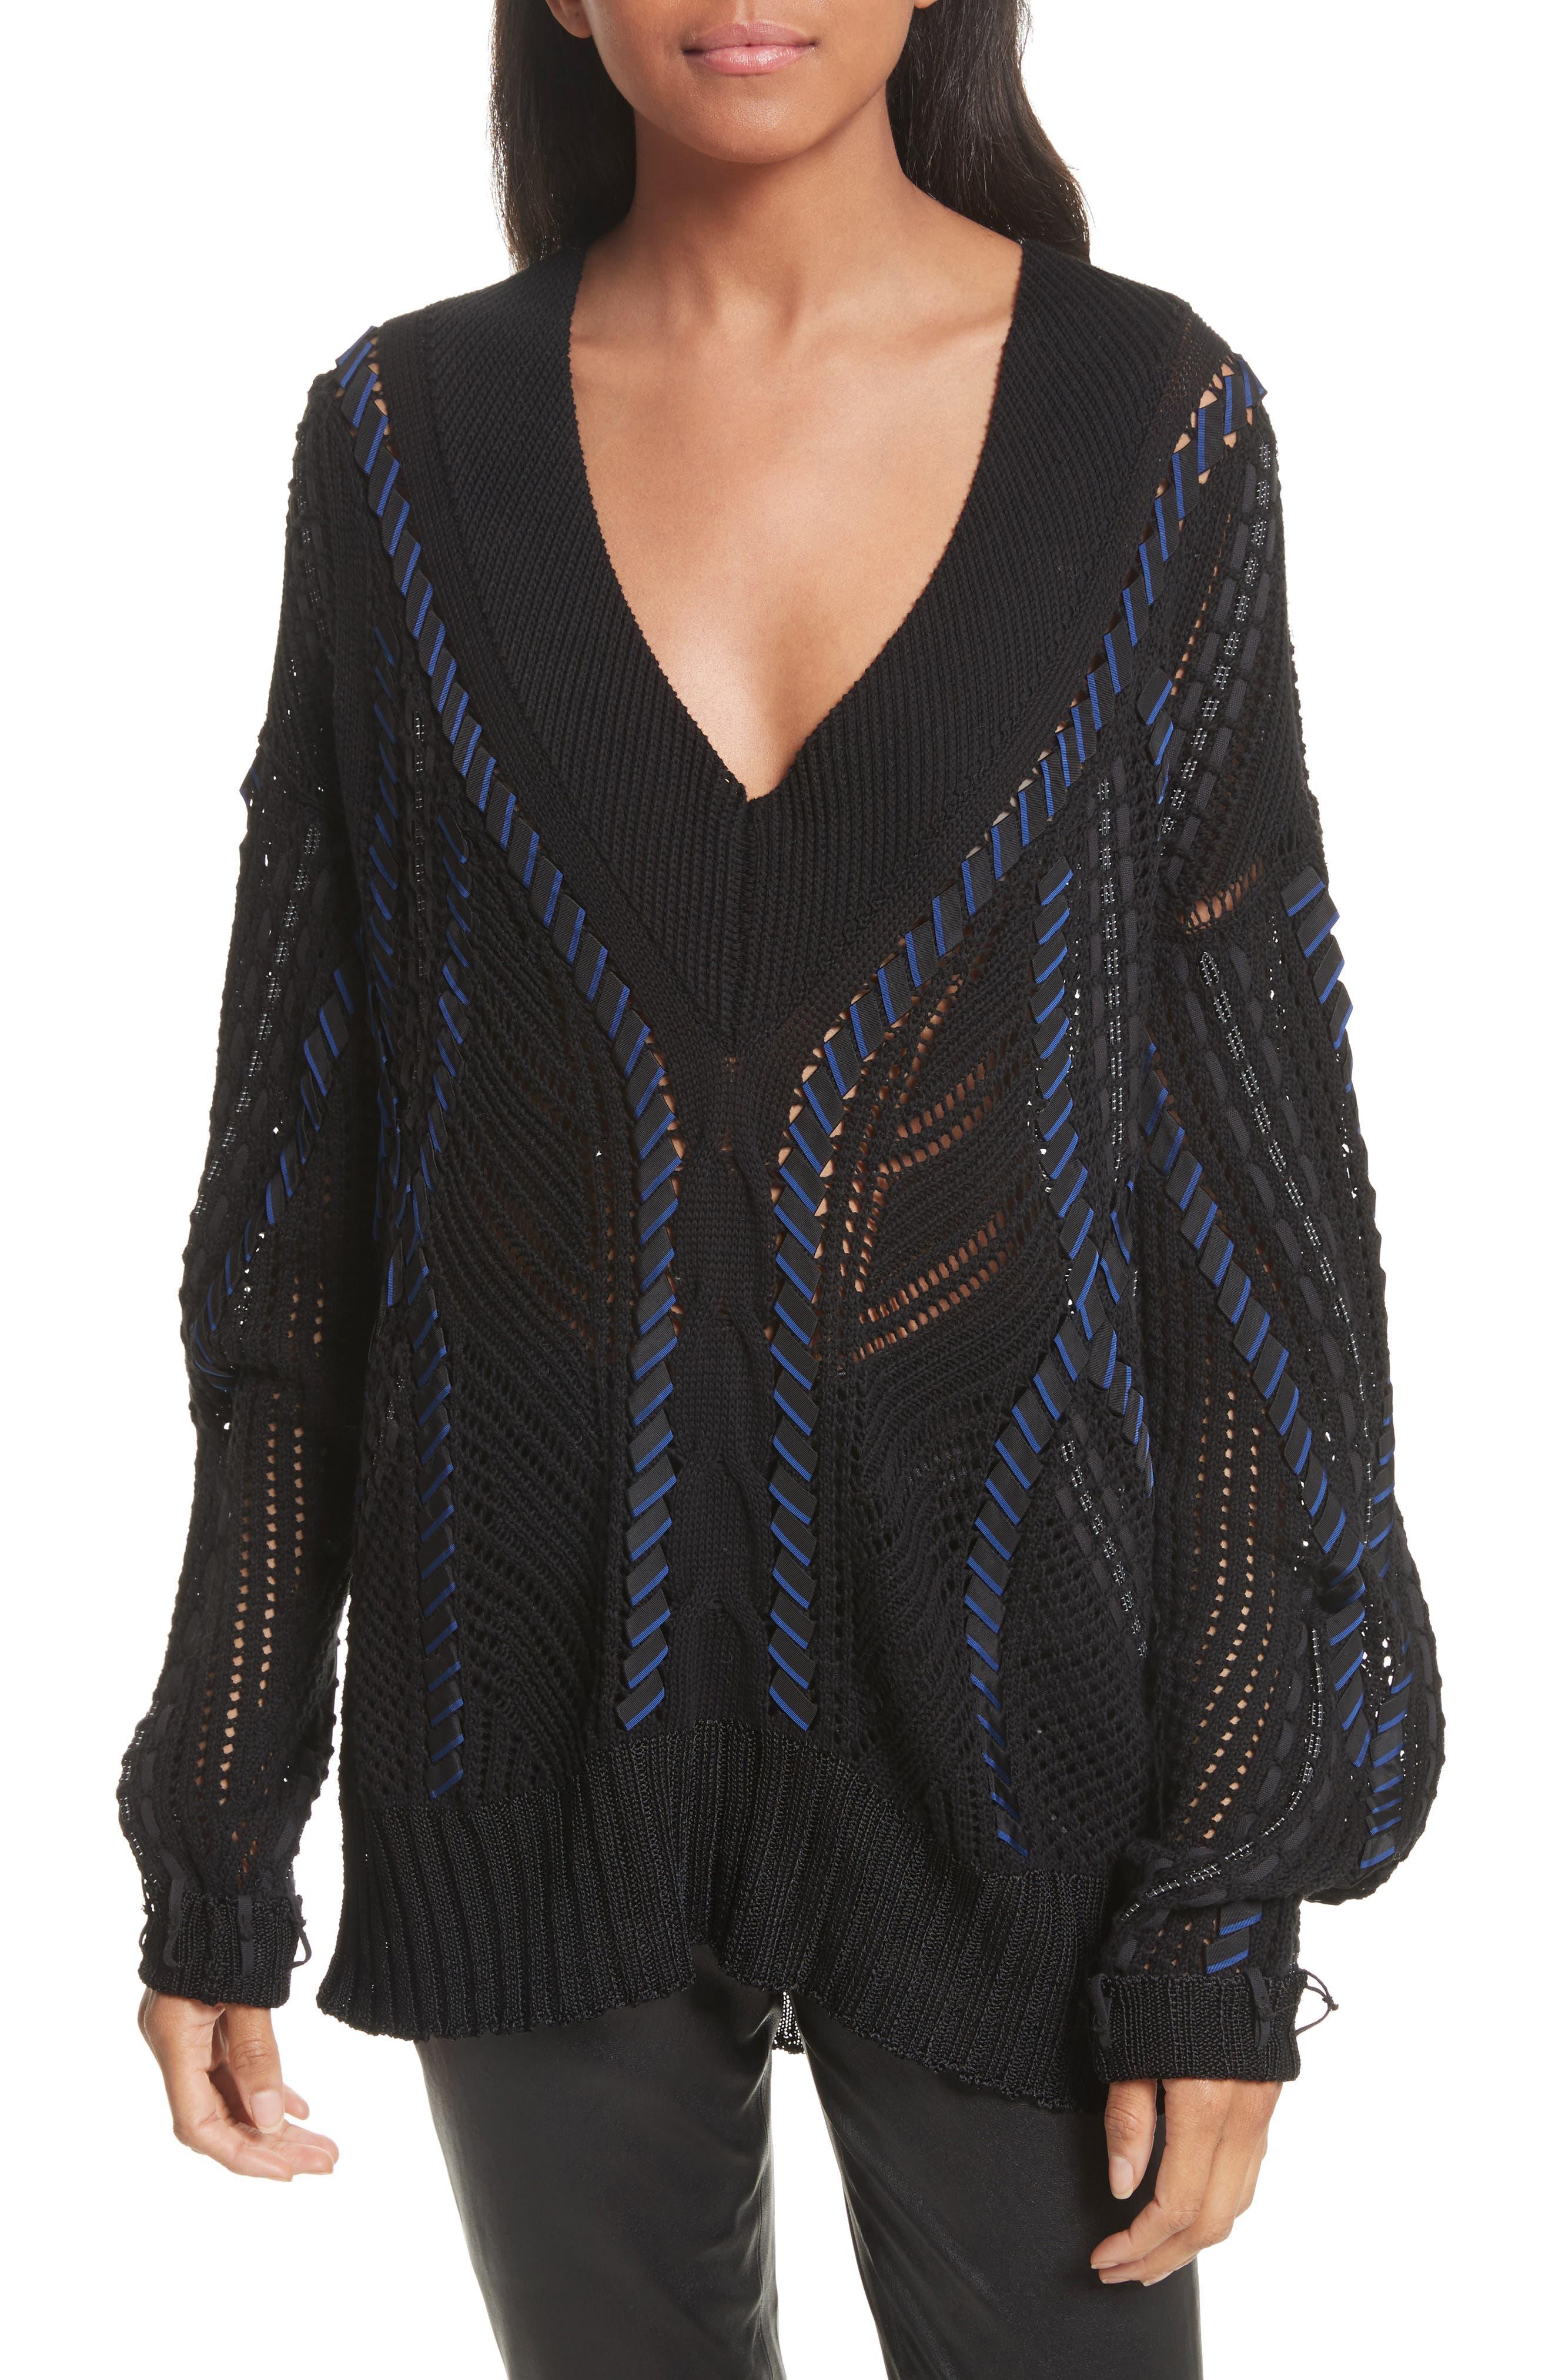 Lucie Pointelle Knit Cotton Blend Sweater,                             Main thumbnail 1, color,                             001